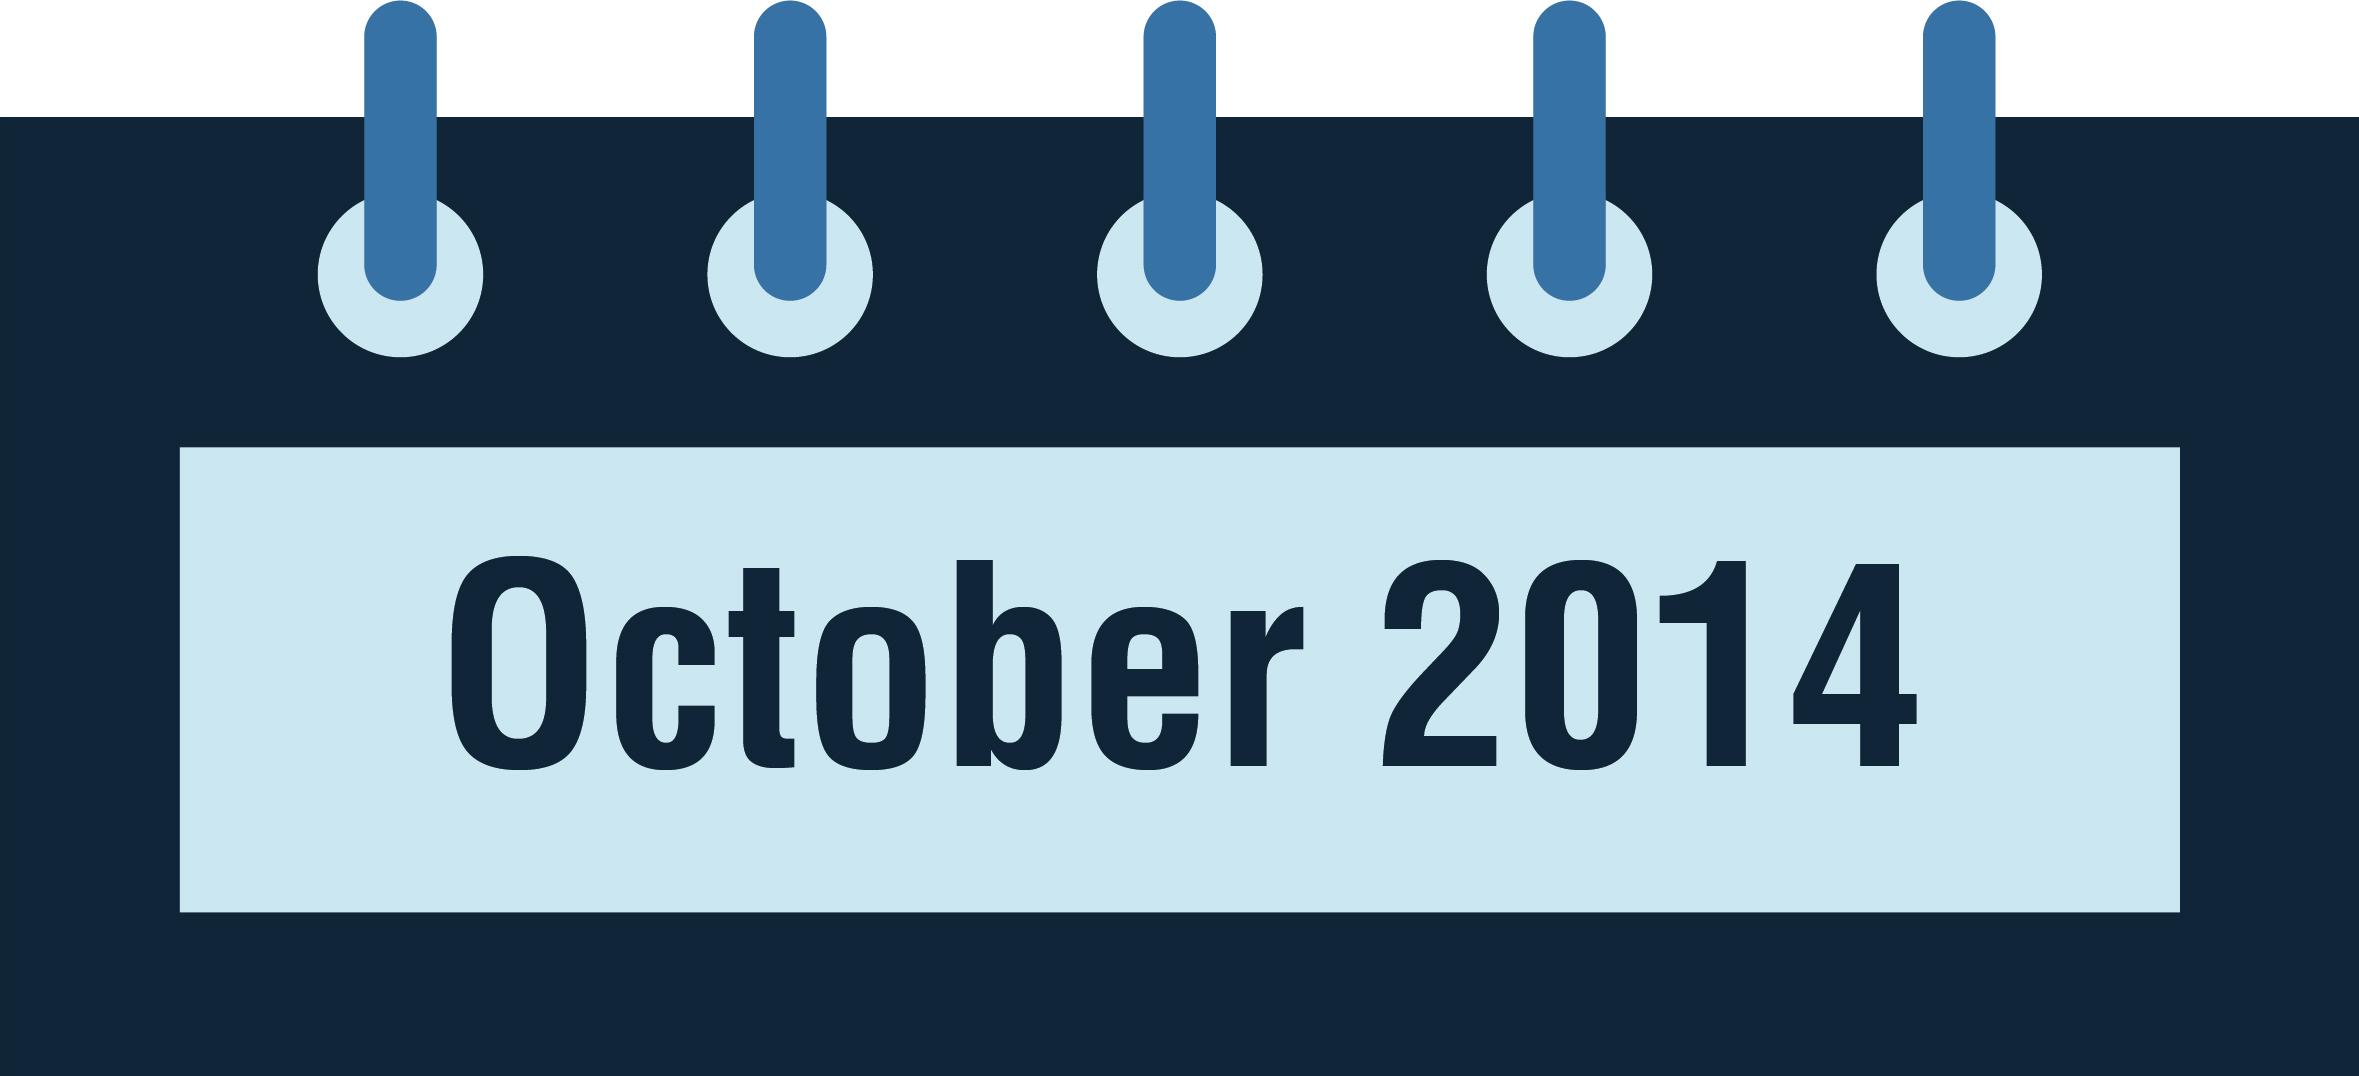 NeuroCheck History - October 2014 (Image © NeuroCheck)